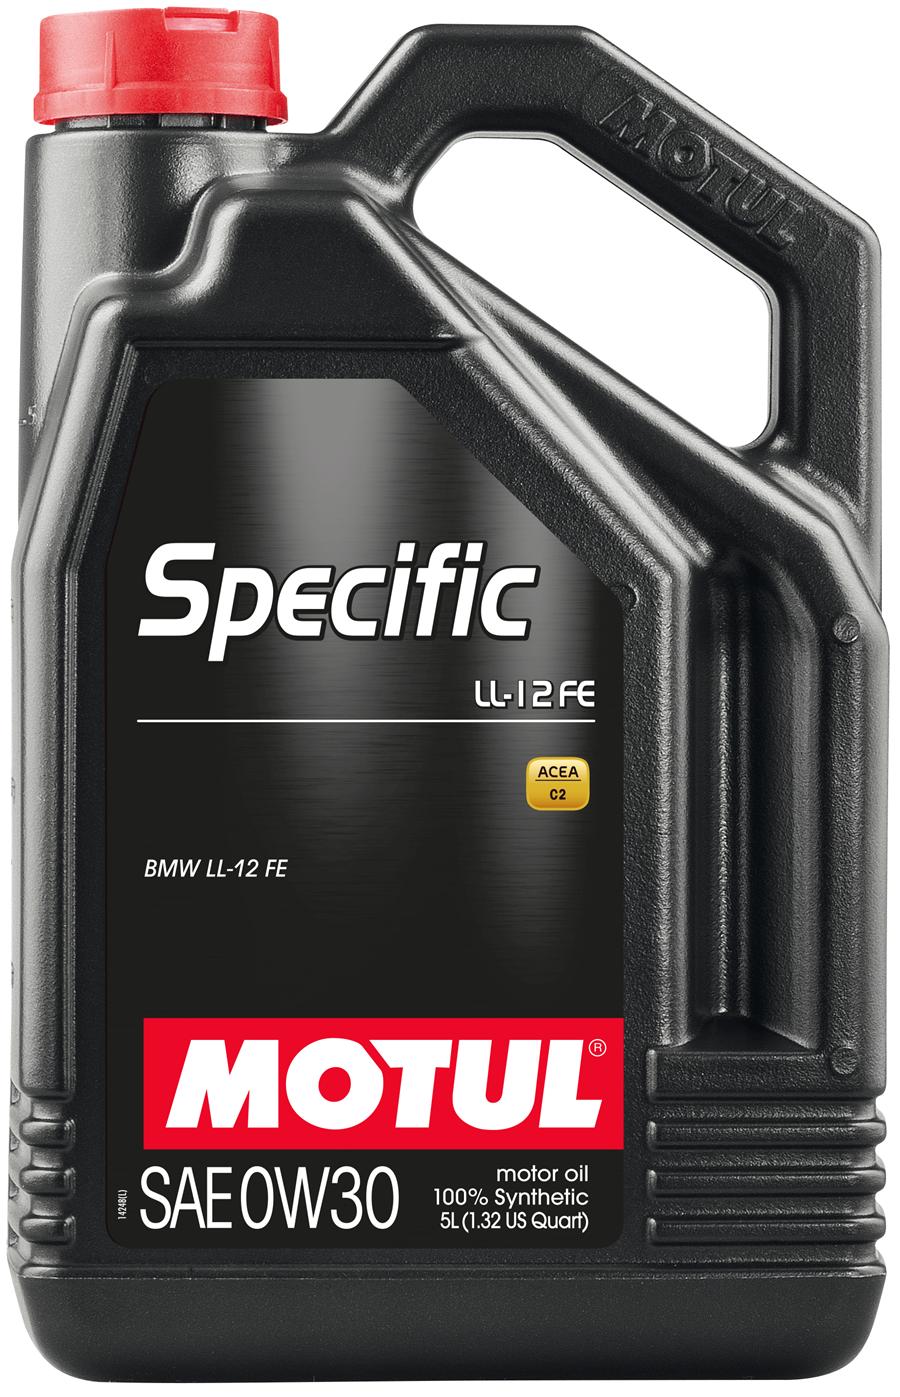 Motul Specific BMW LL12 FE 0W30 Синтетическое моторное масло